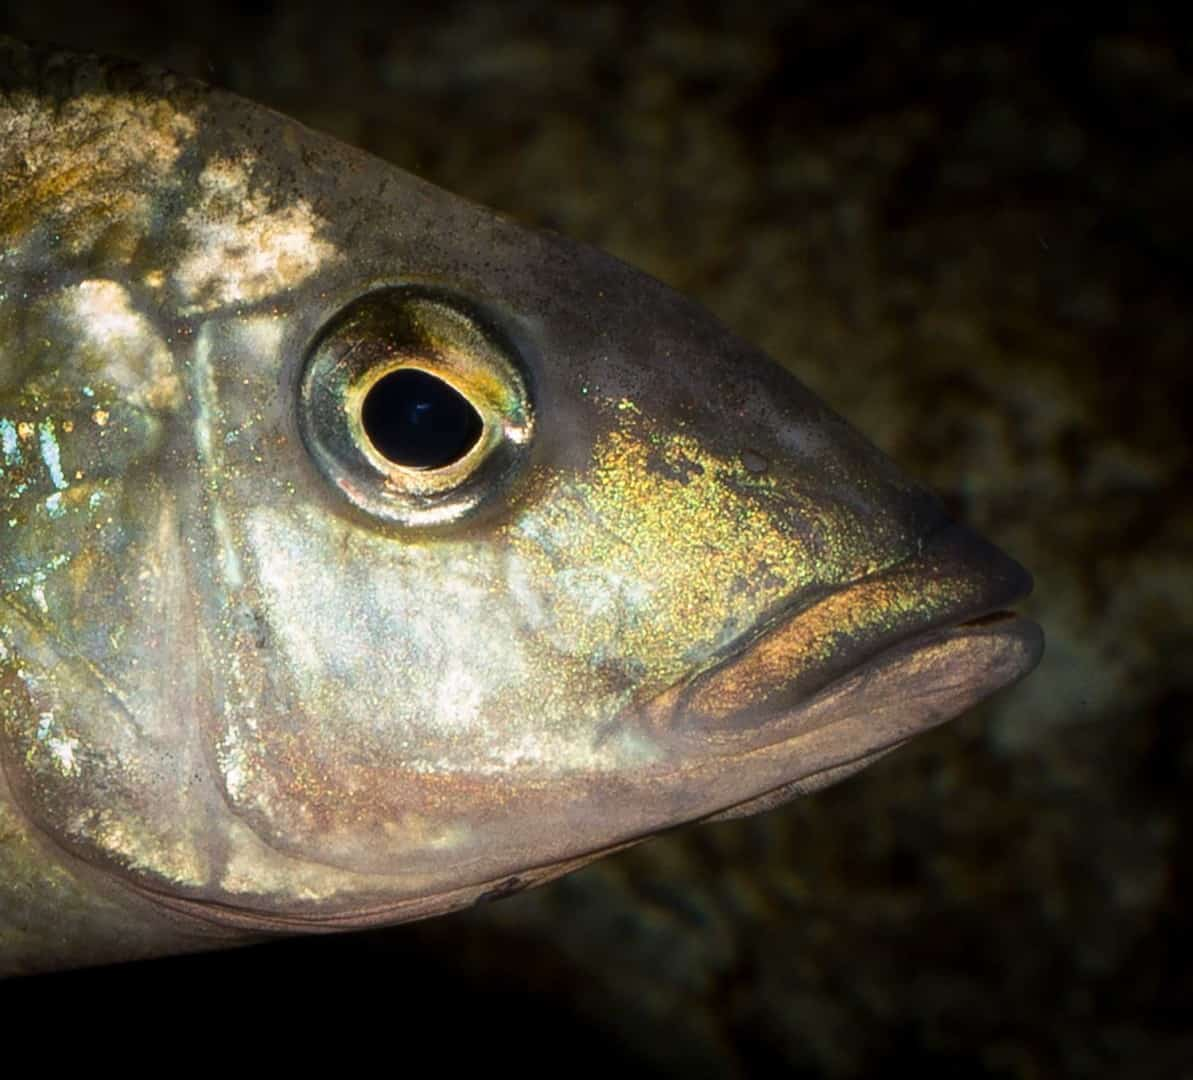 Fossorochromis rostratus - Fünffleckmaulbrüter 2